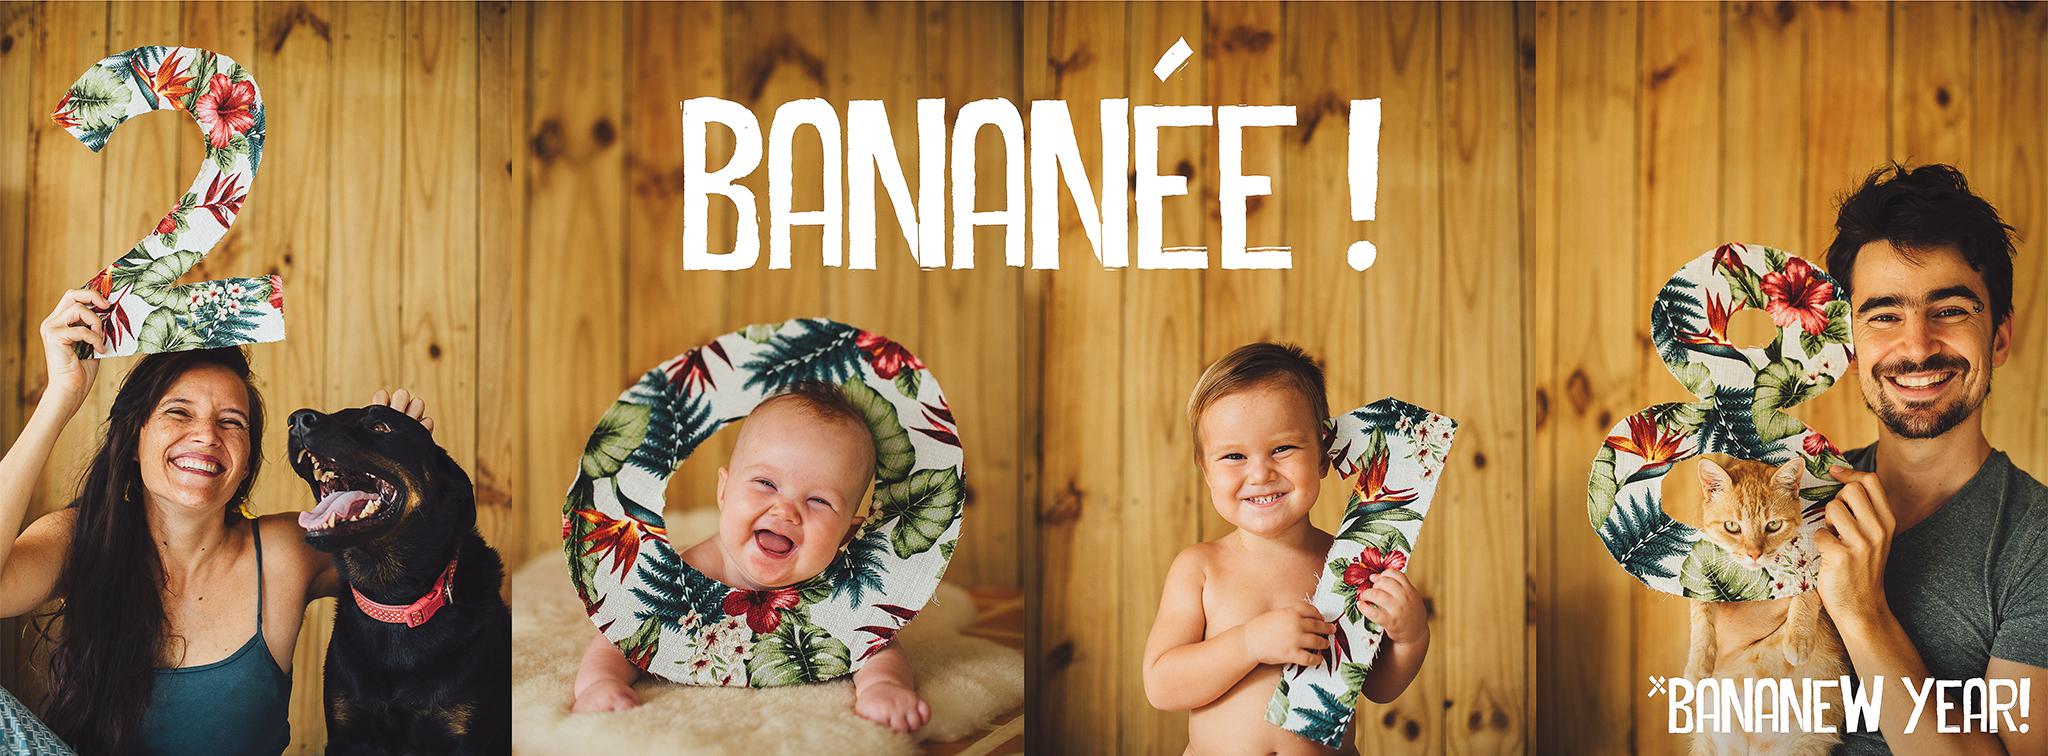 BananewYear2018-instagram copy.jpg